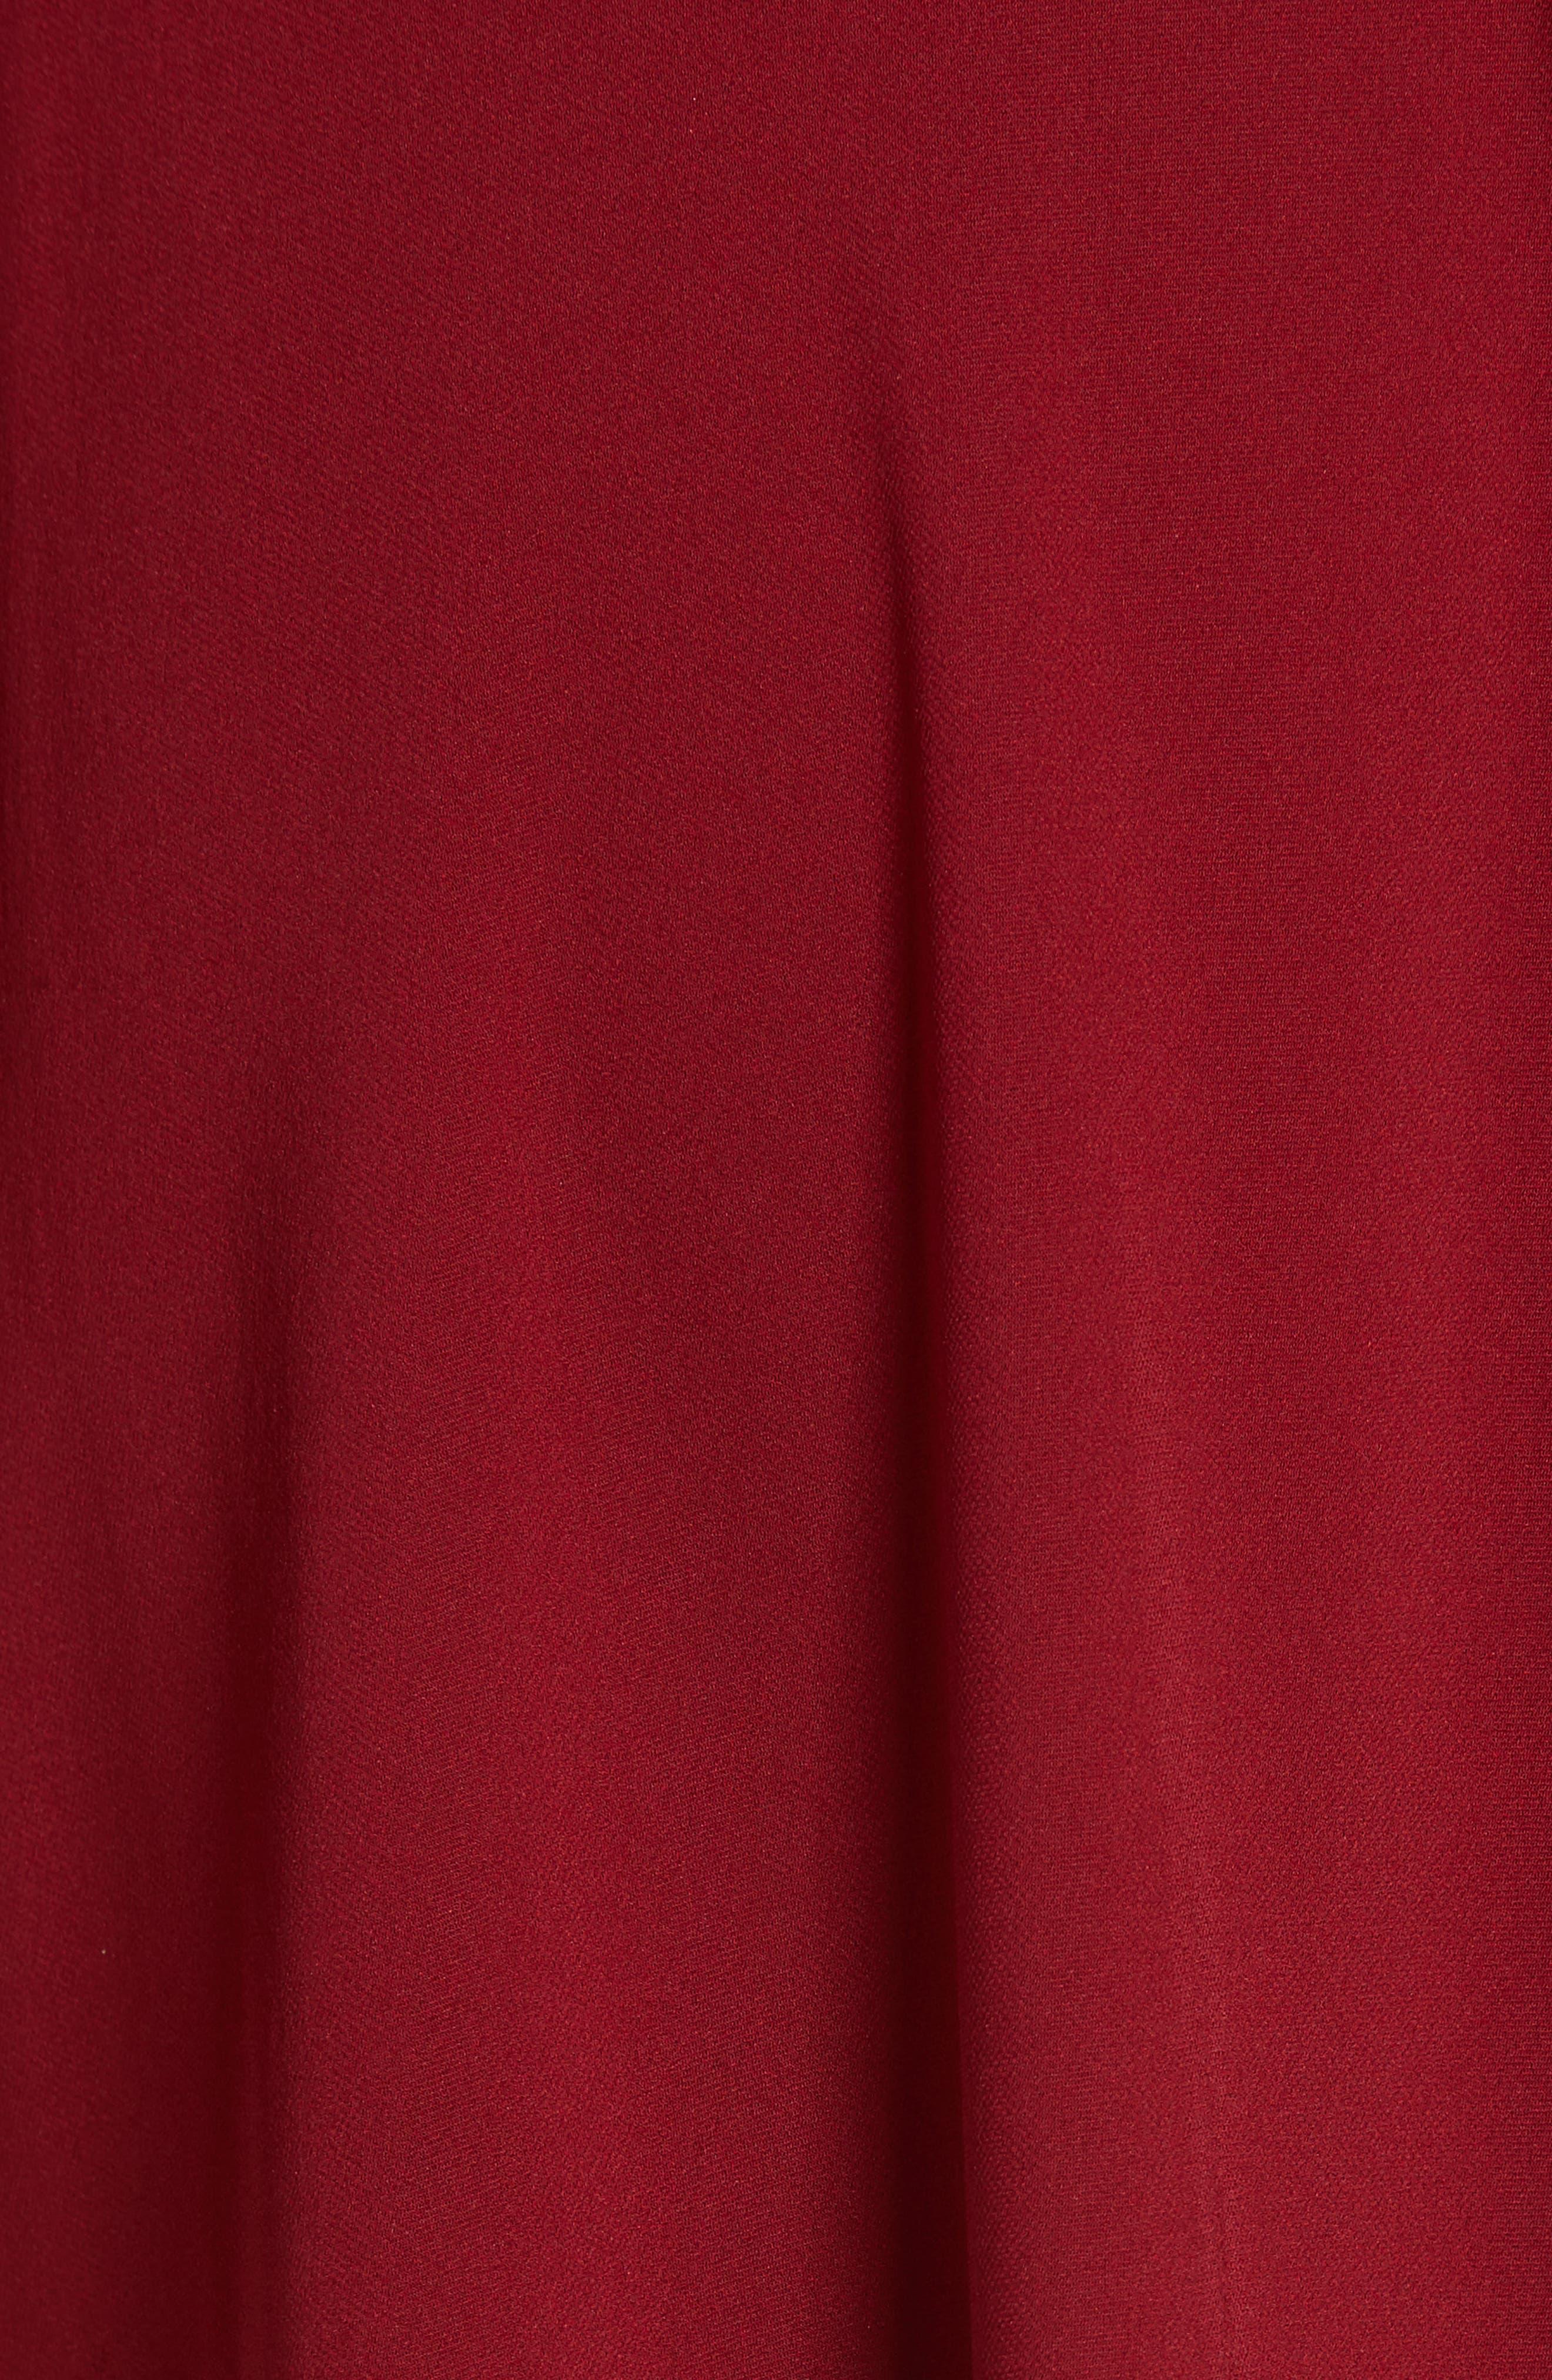 Asymmetrical Stripe Stretch Silk Midi Skirt,                             Alternate thumbnail 5, color,                             BURGUNDY/ RUBY